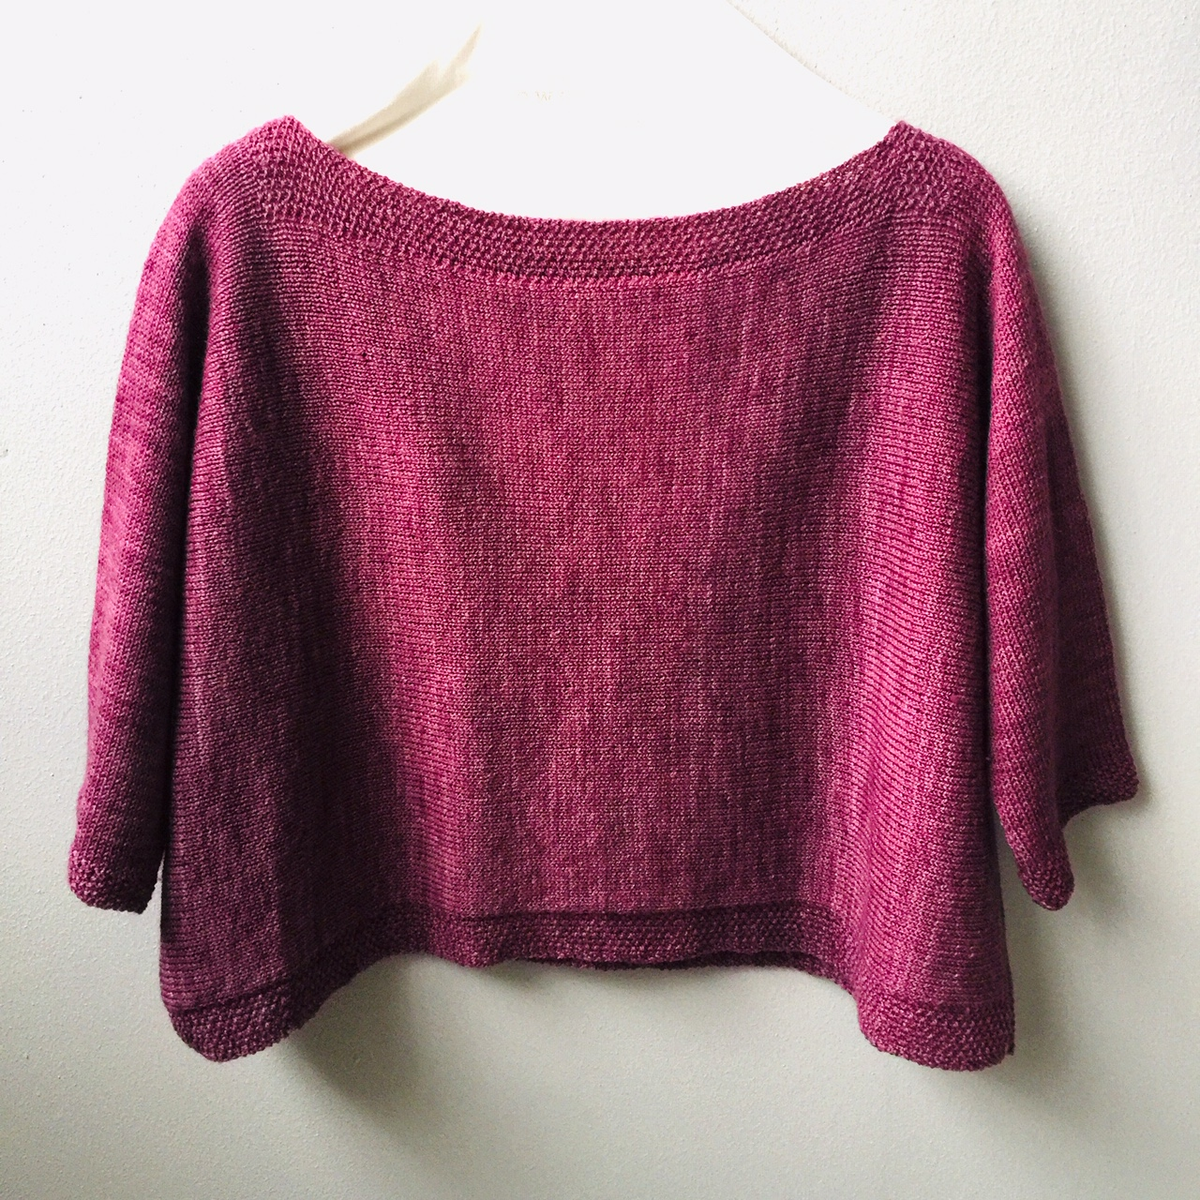 Geneva Knit Jersey pattern by Cowgirlblues